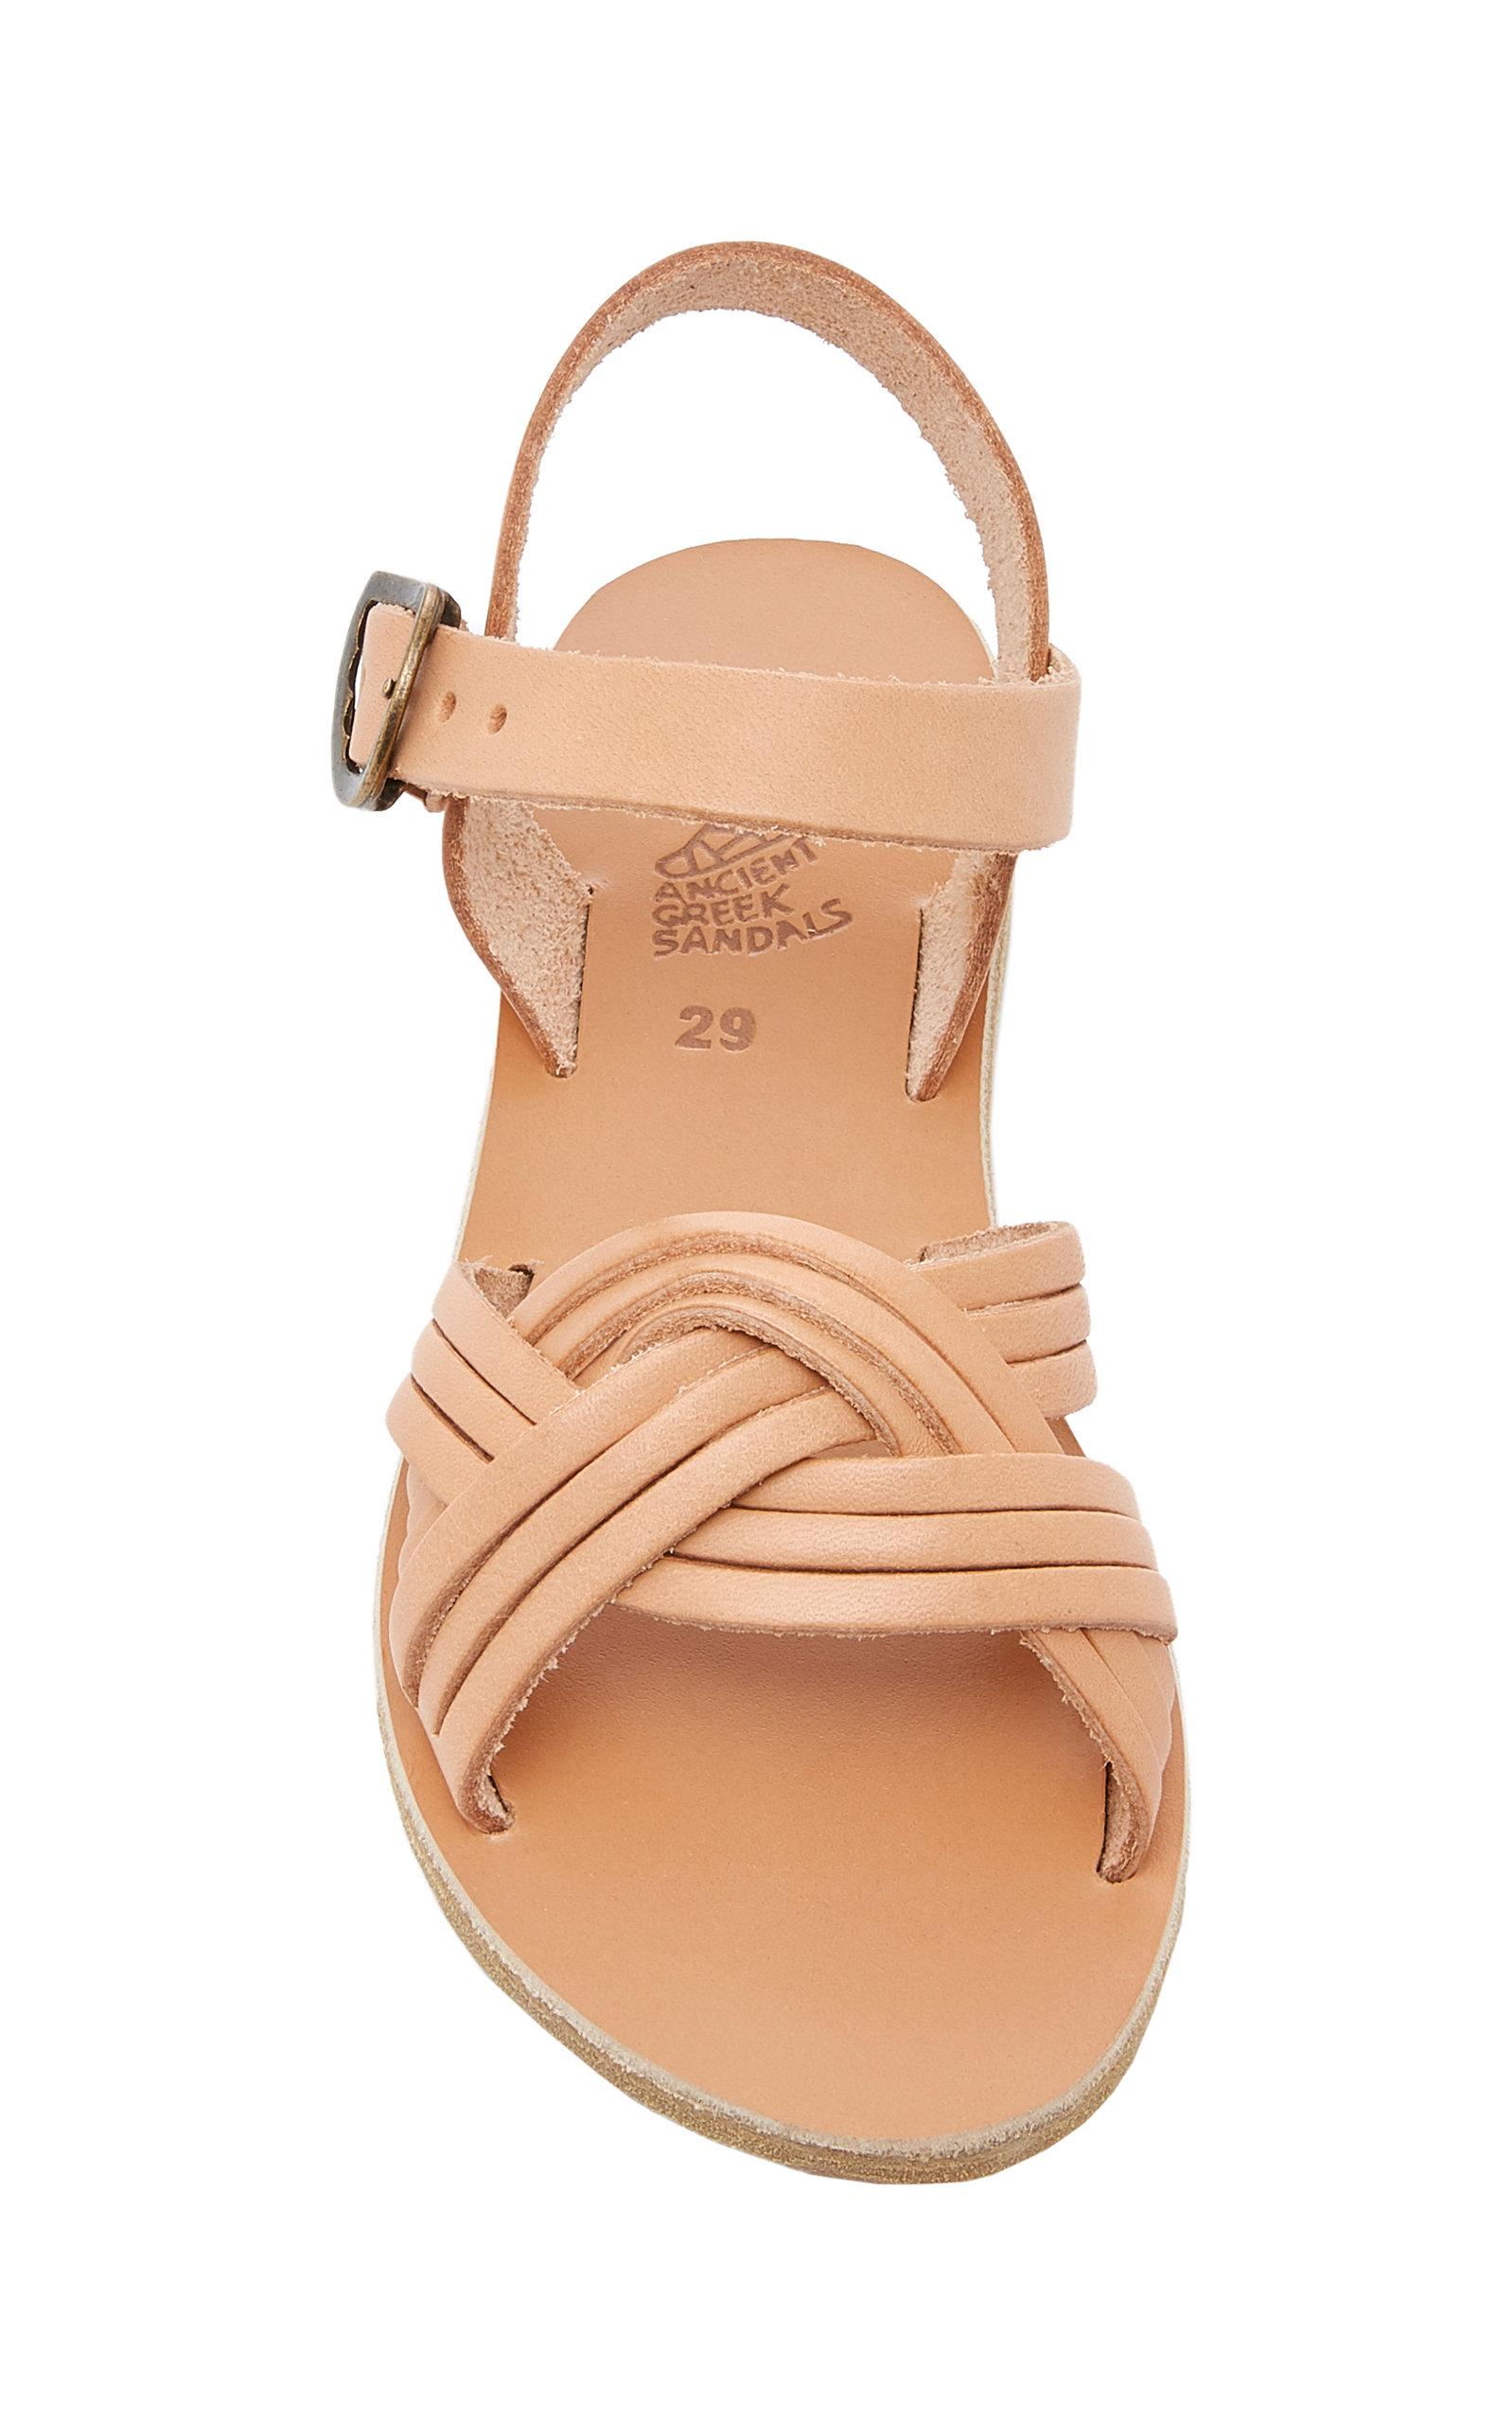 Little Electra By Ancient Greek Operandi Sandal Moda Sandals r1CqxrEw